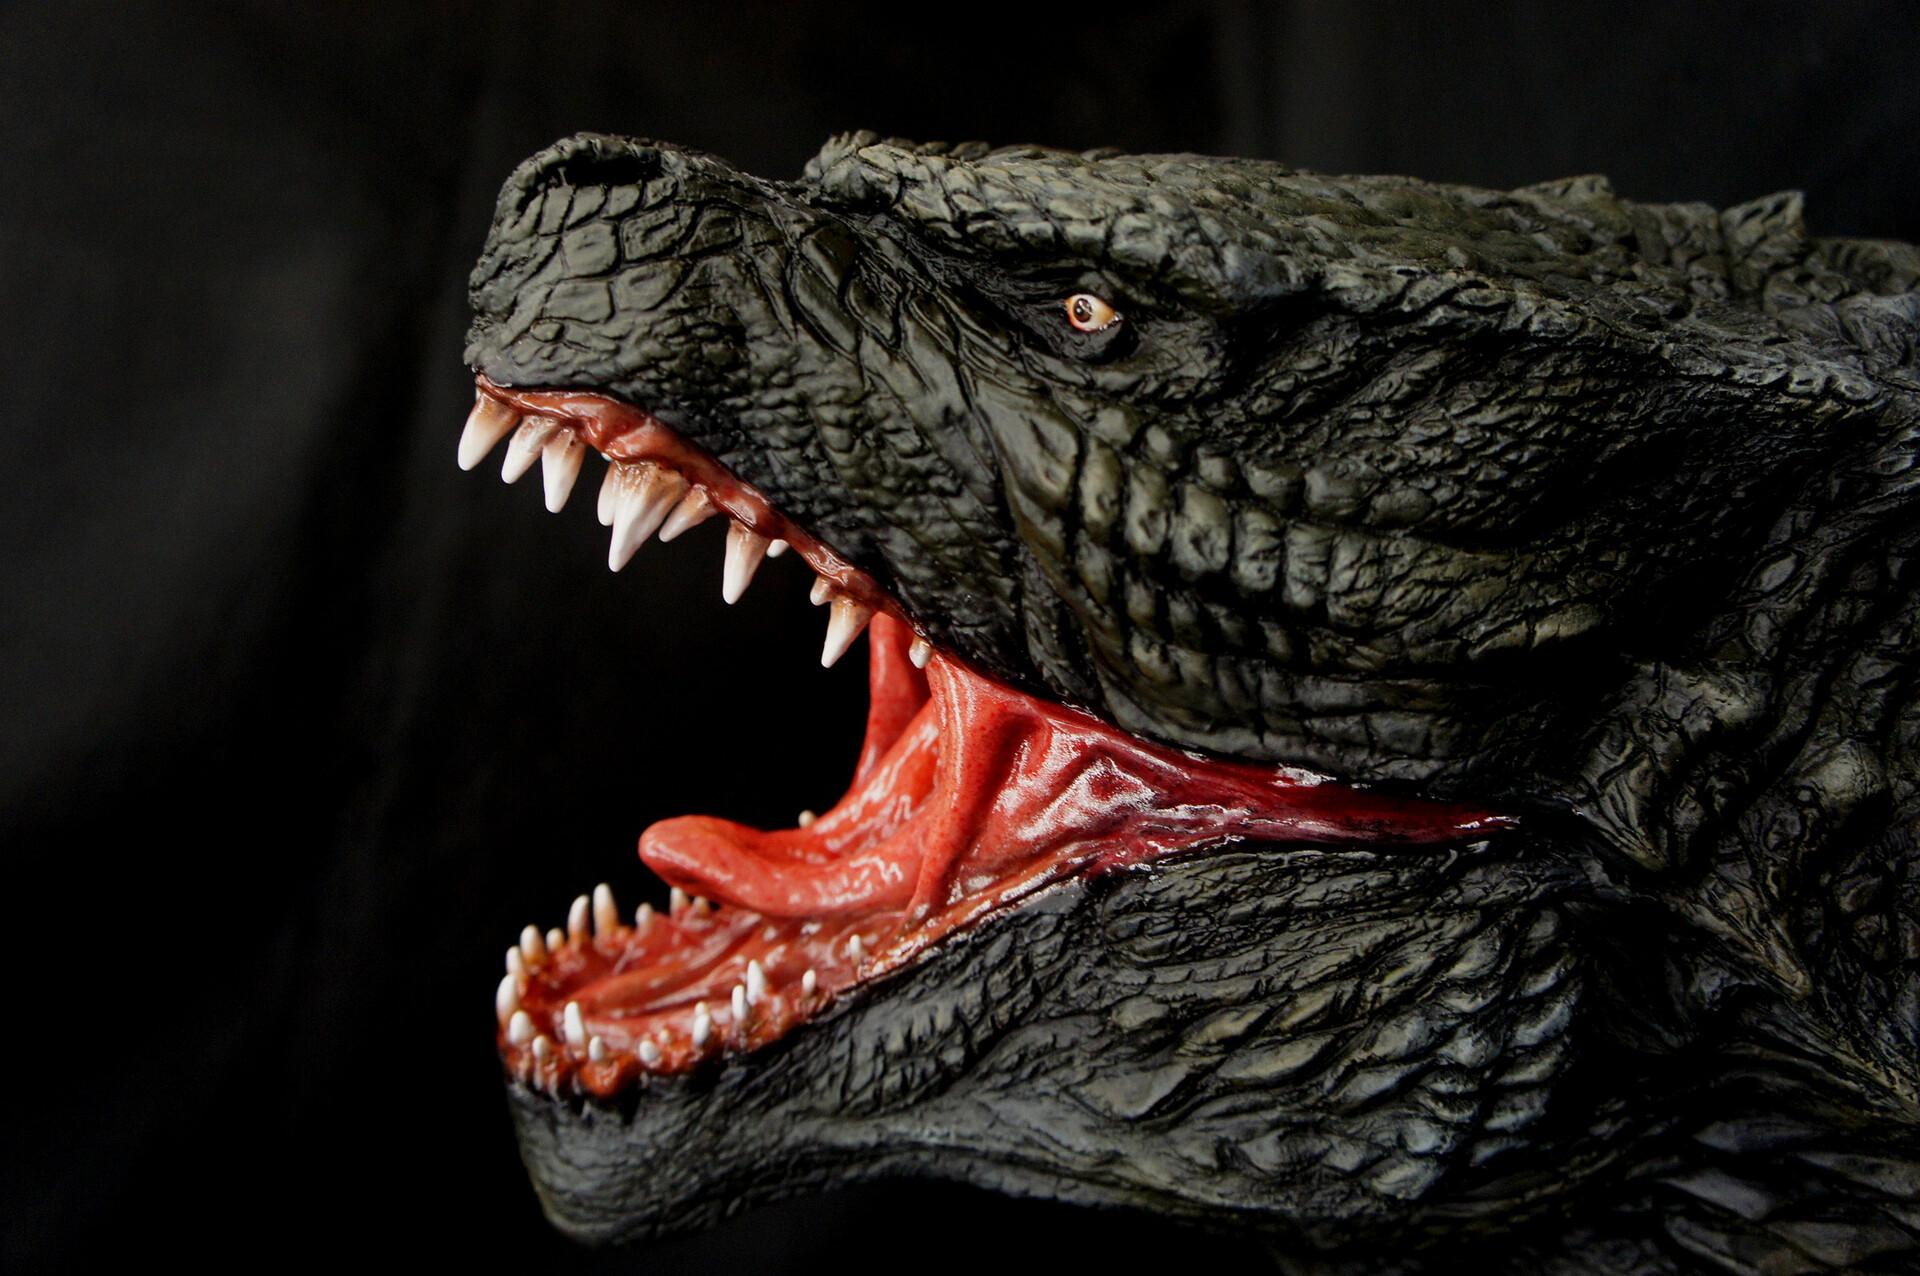 Godzilla 2014 Head Studio Scale Wall-Hanger  https://www.solidart.club/